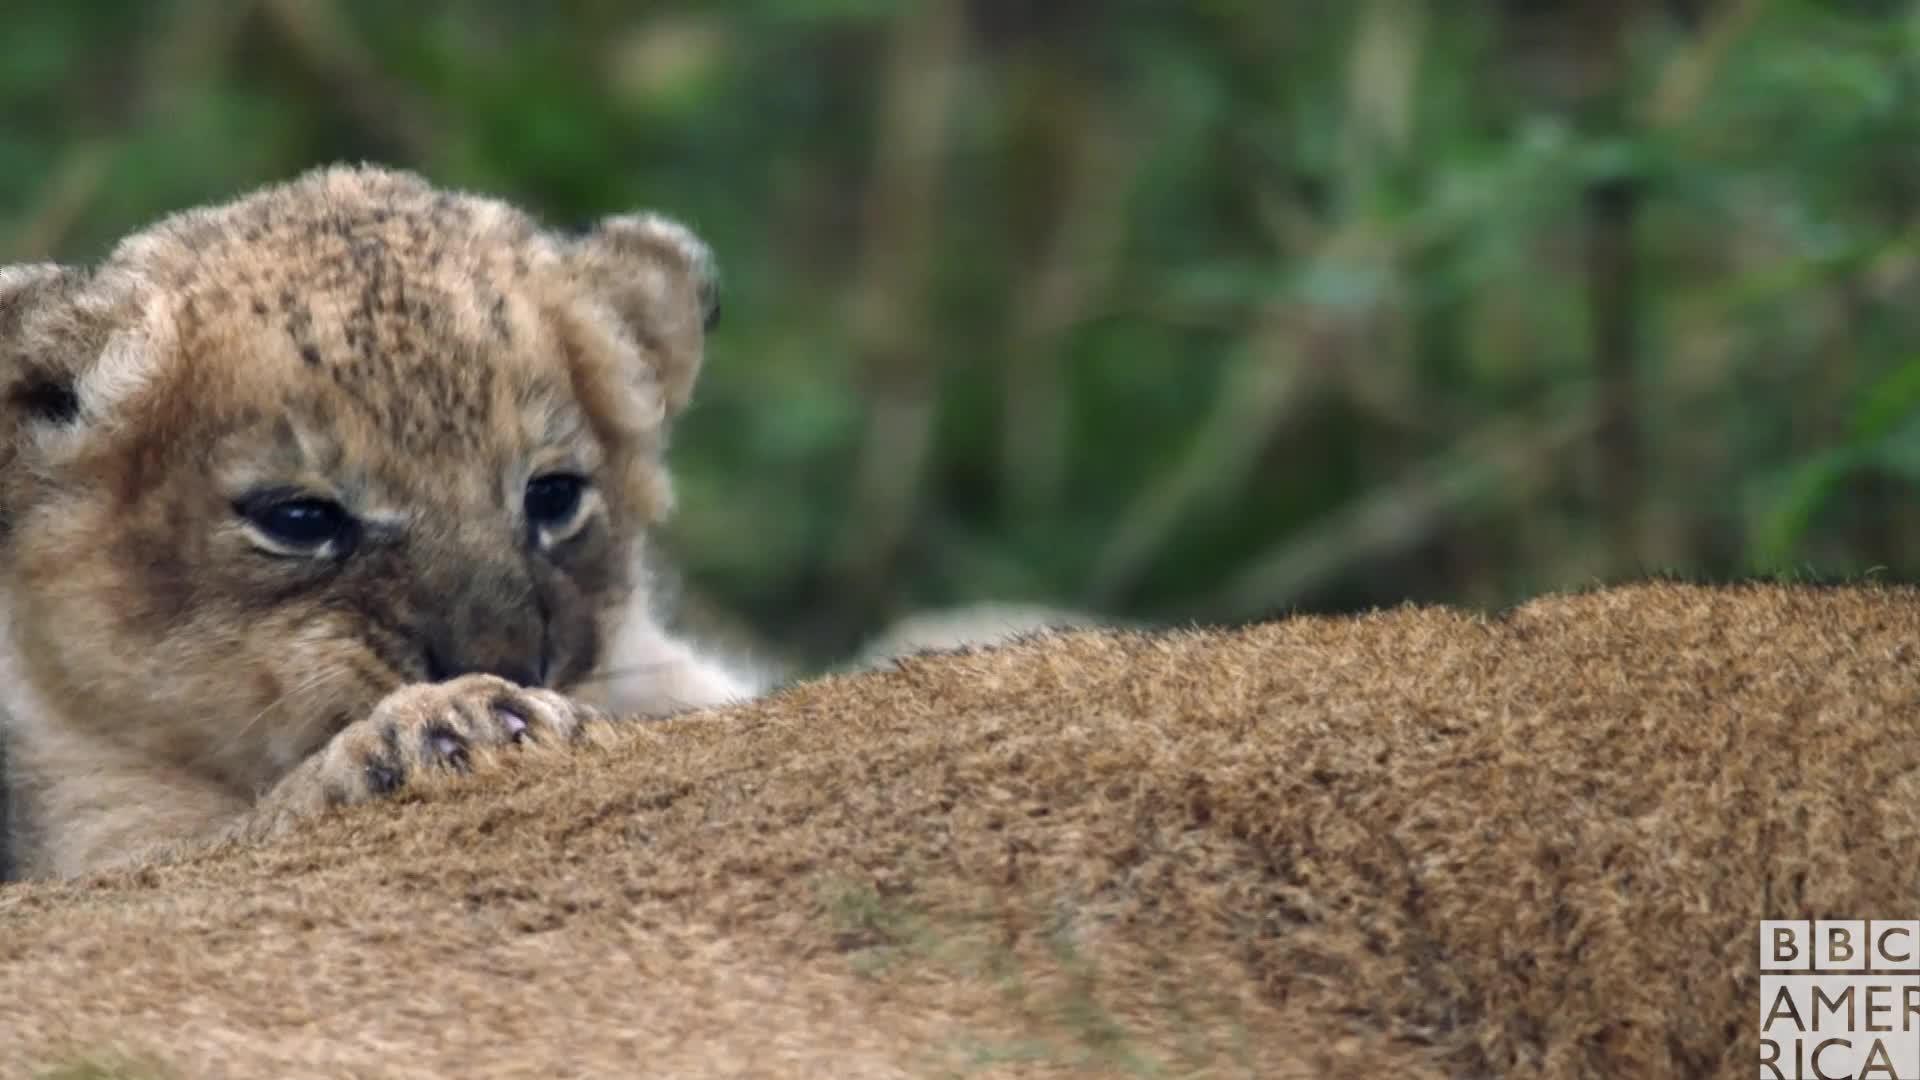 animal, animals, awww, bbc america, bbc america: dynasties, dynasties, lion, lions, sleep, sleepy, tired, zzz, Dynasties Lion Cub Sleepy GIFs